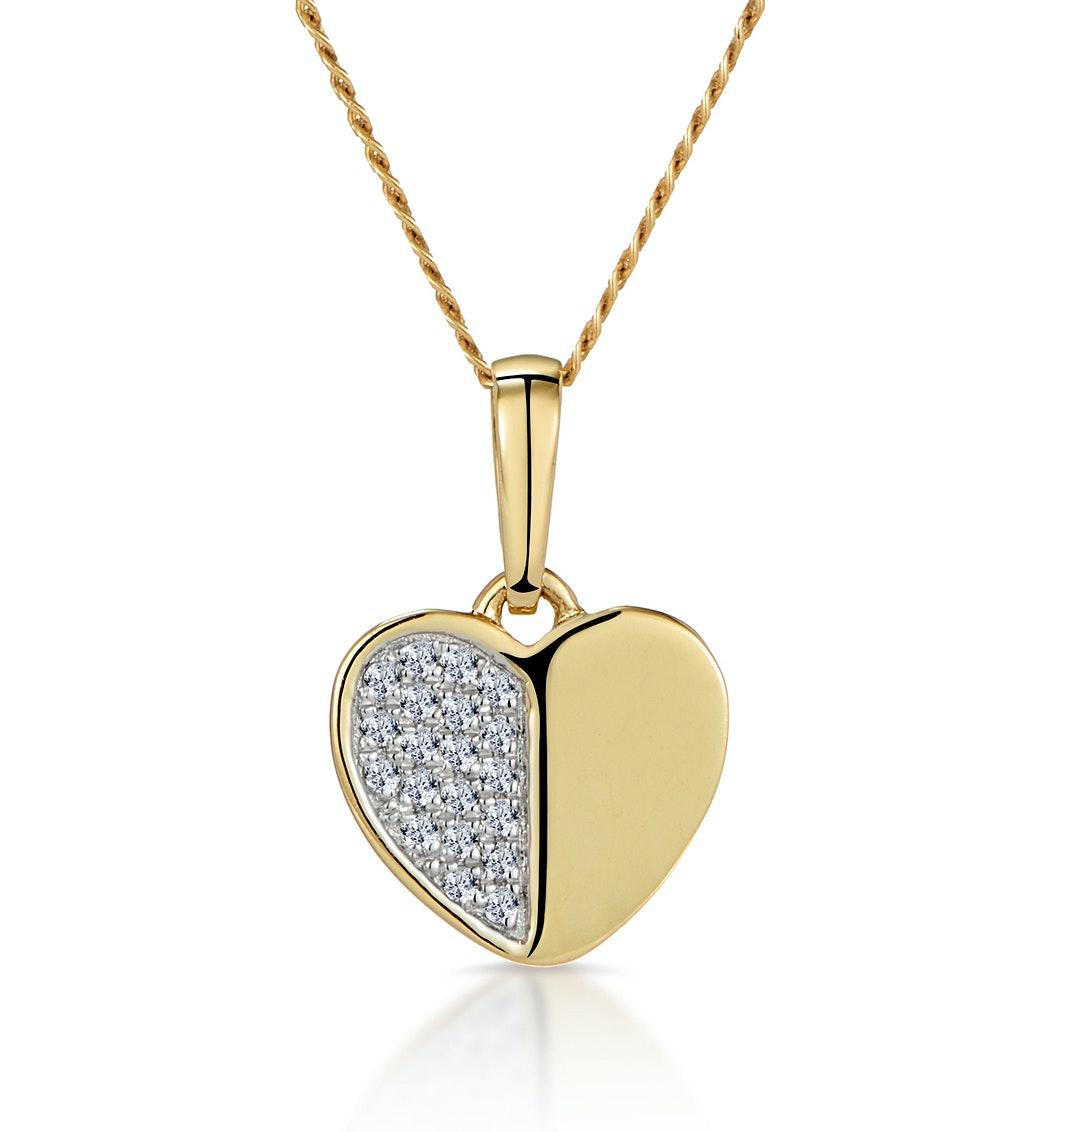 Stellato Heart Diamond Necklace in 9K Gold